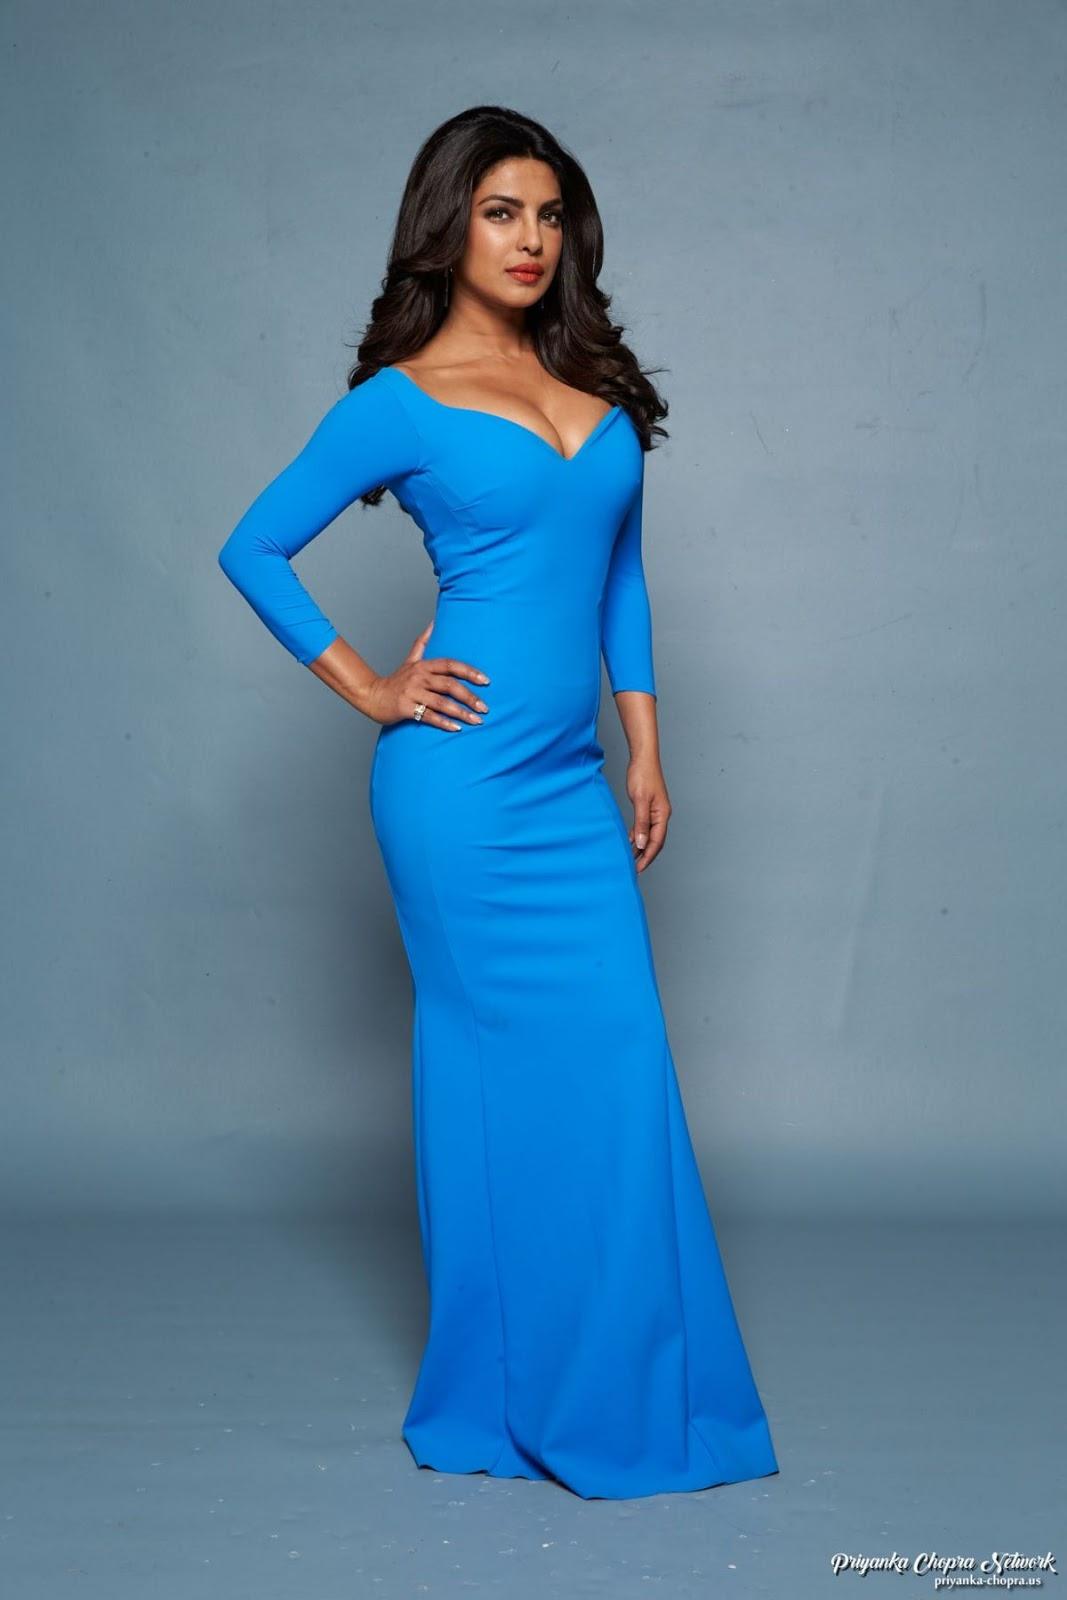 Priyanka Chopra Sizzles In Blue Gown For Baywatch Promo -3018